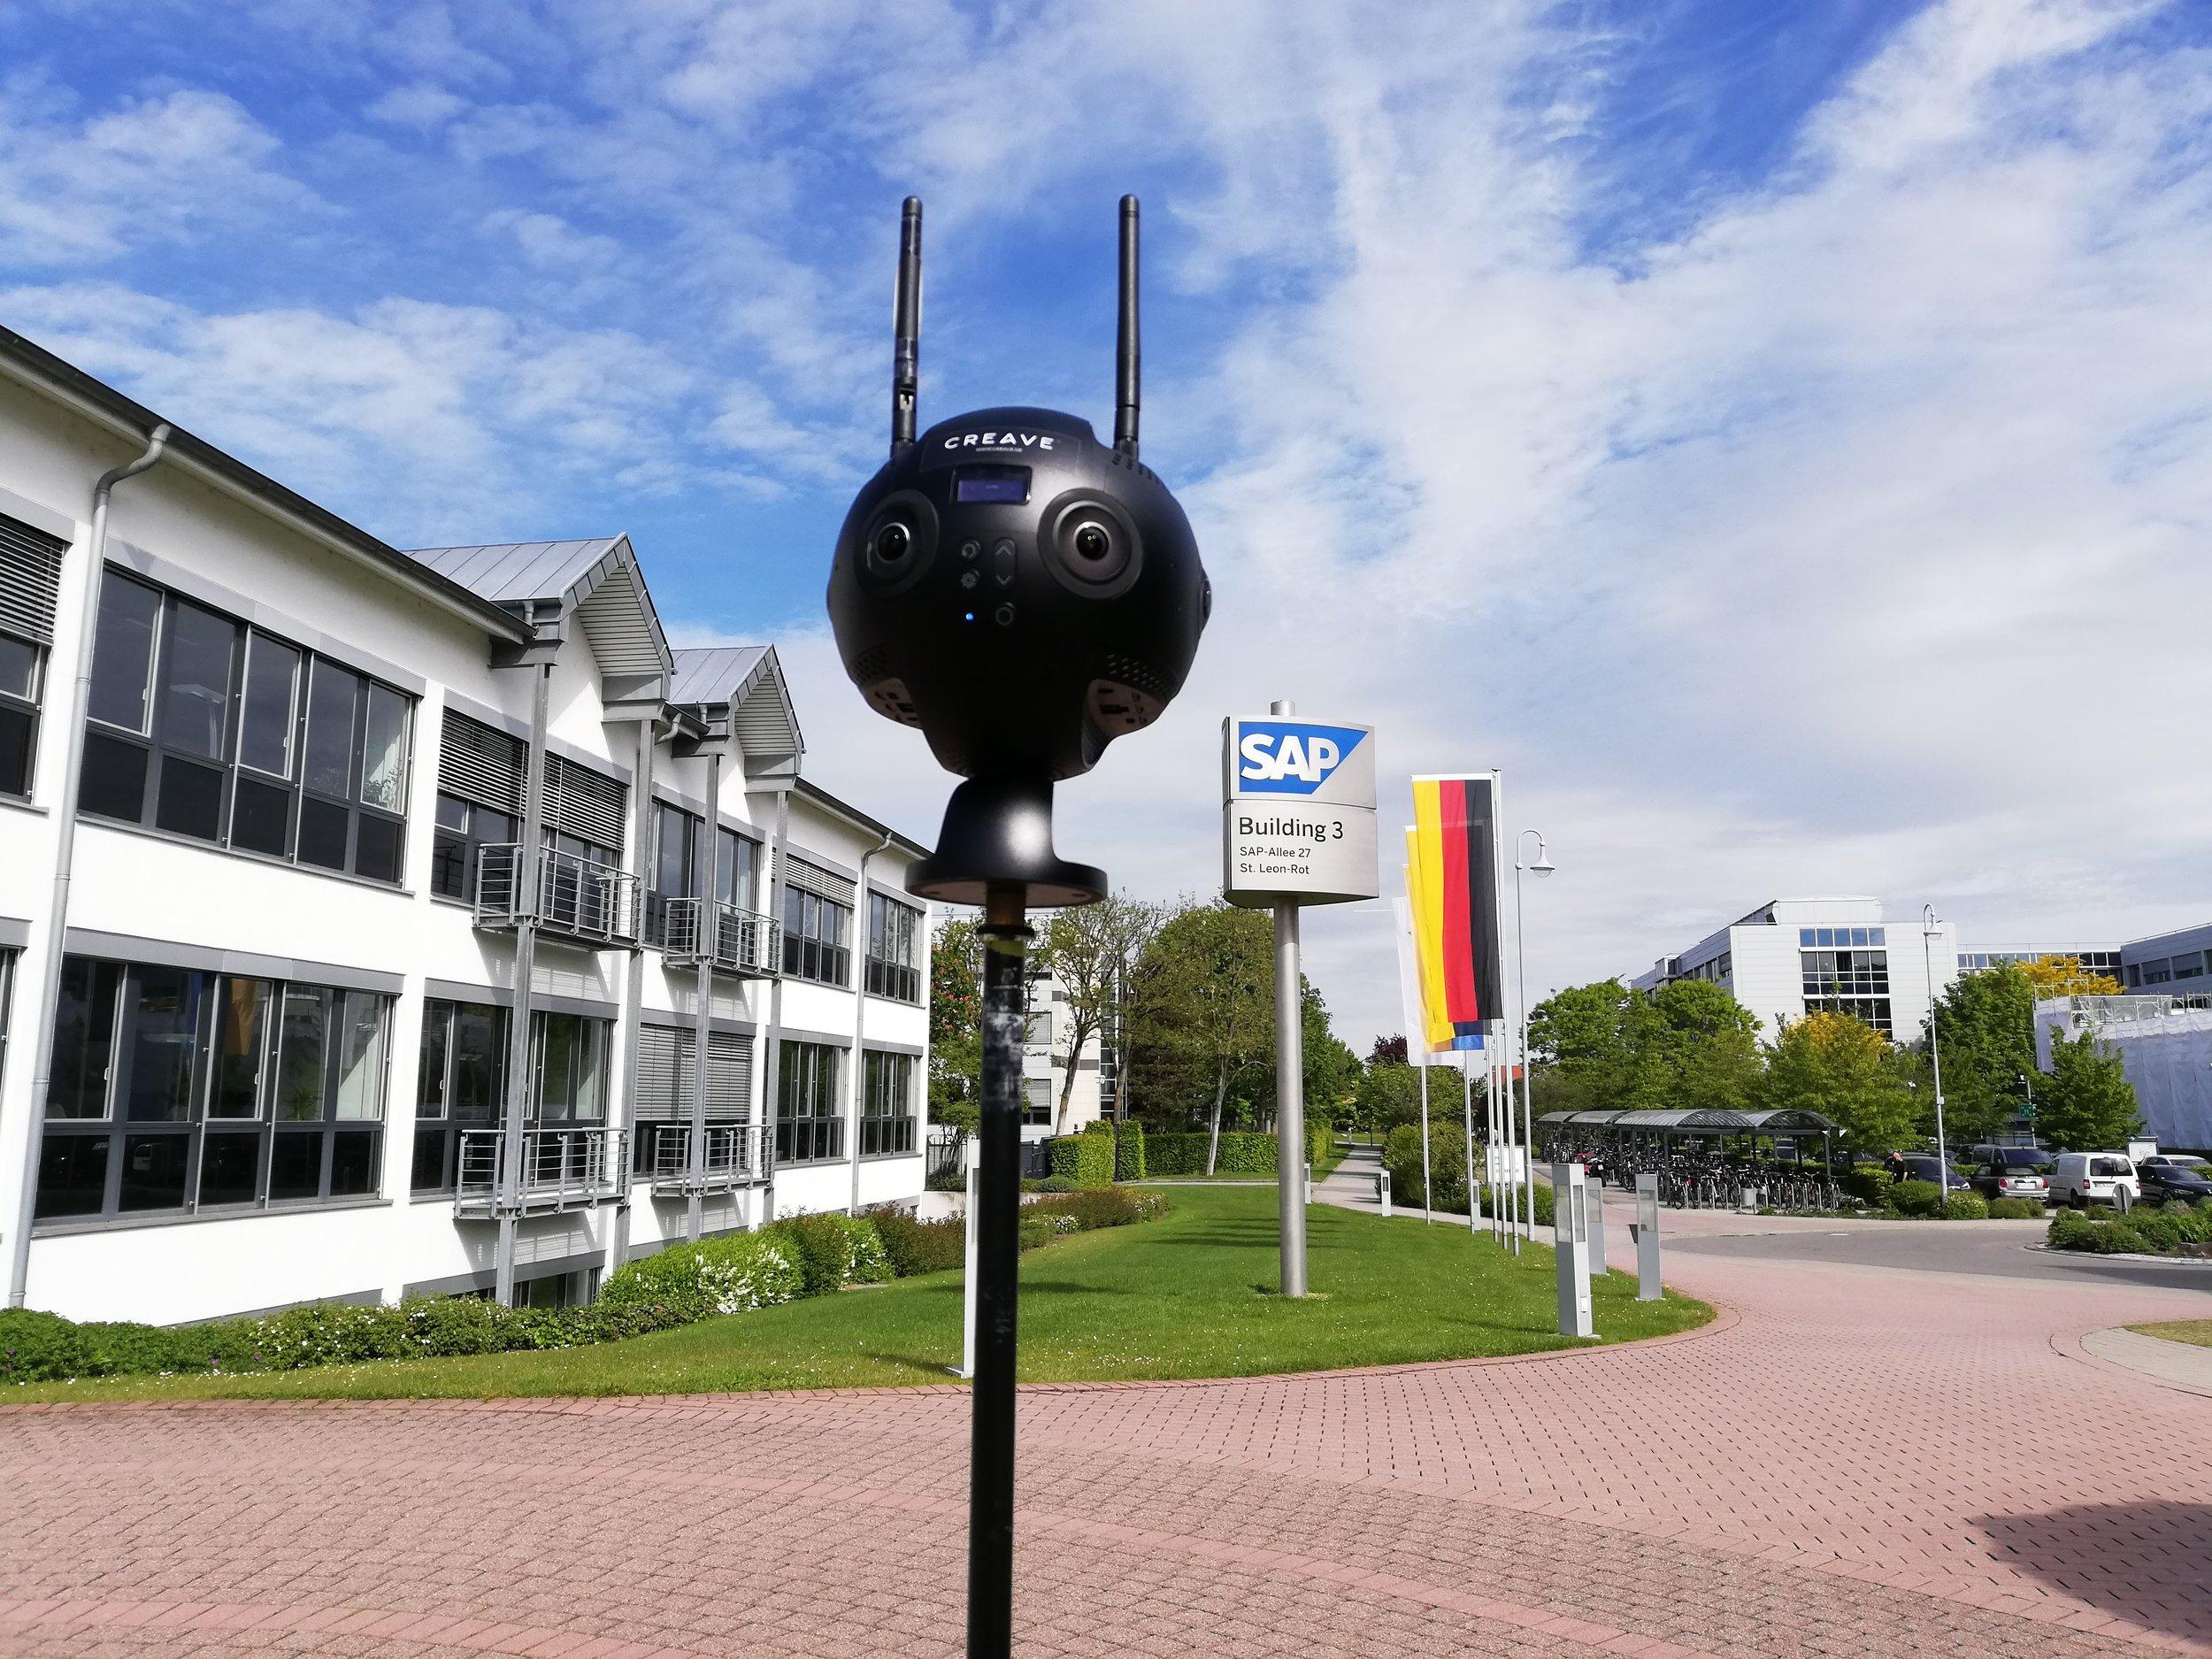 SAP 360° Video - Insta360 Pro2